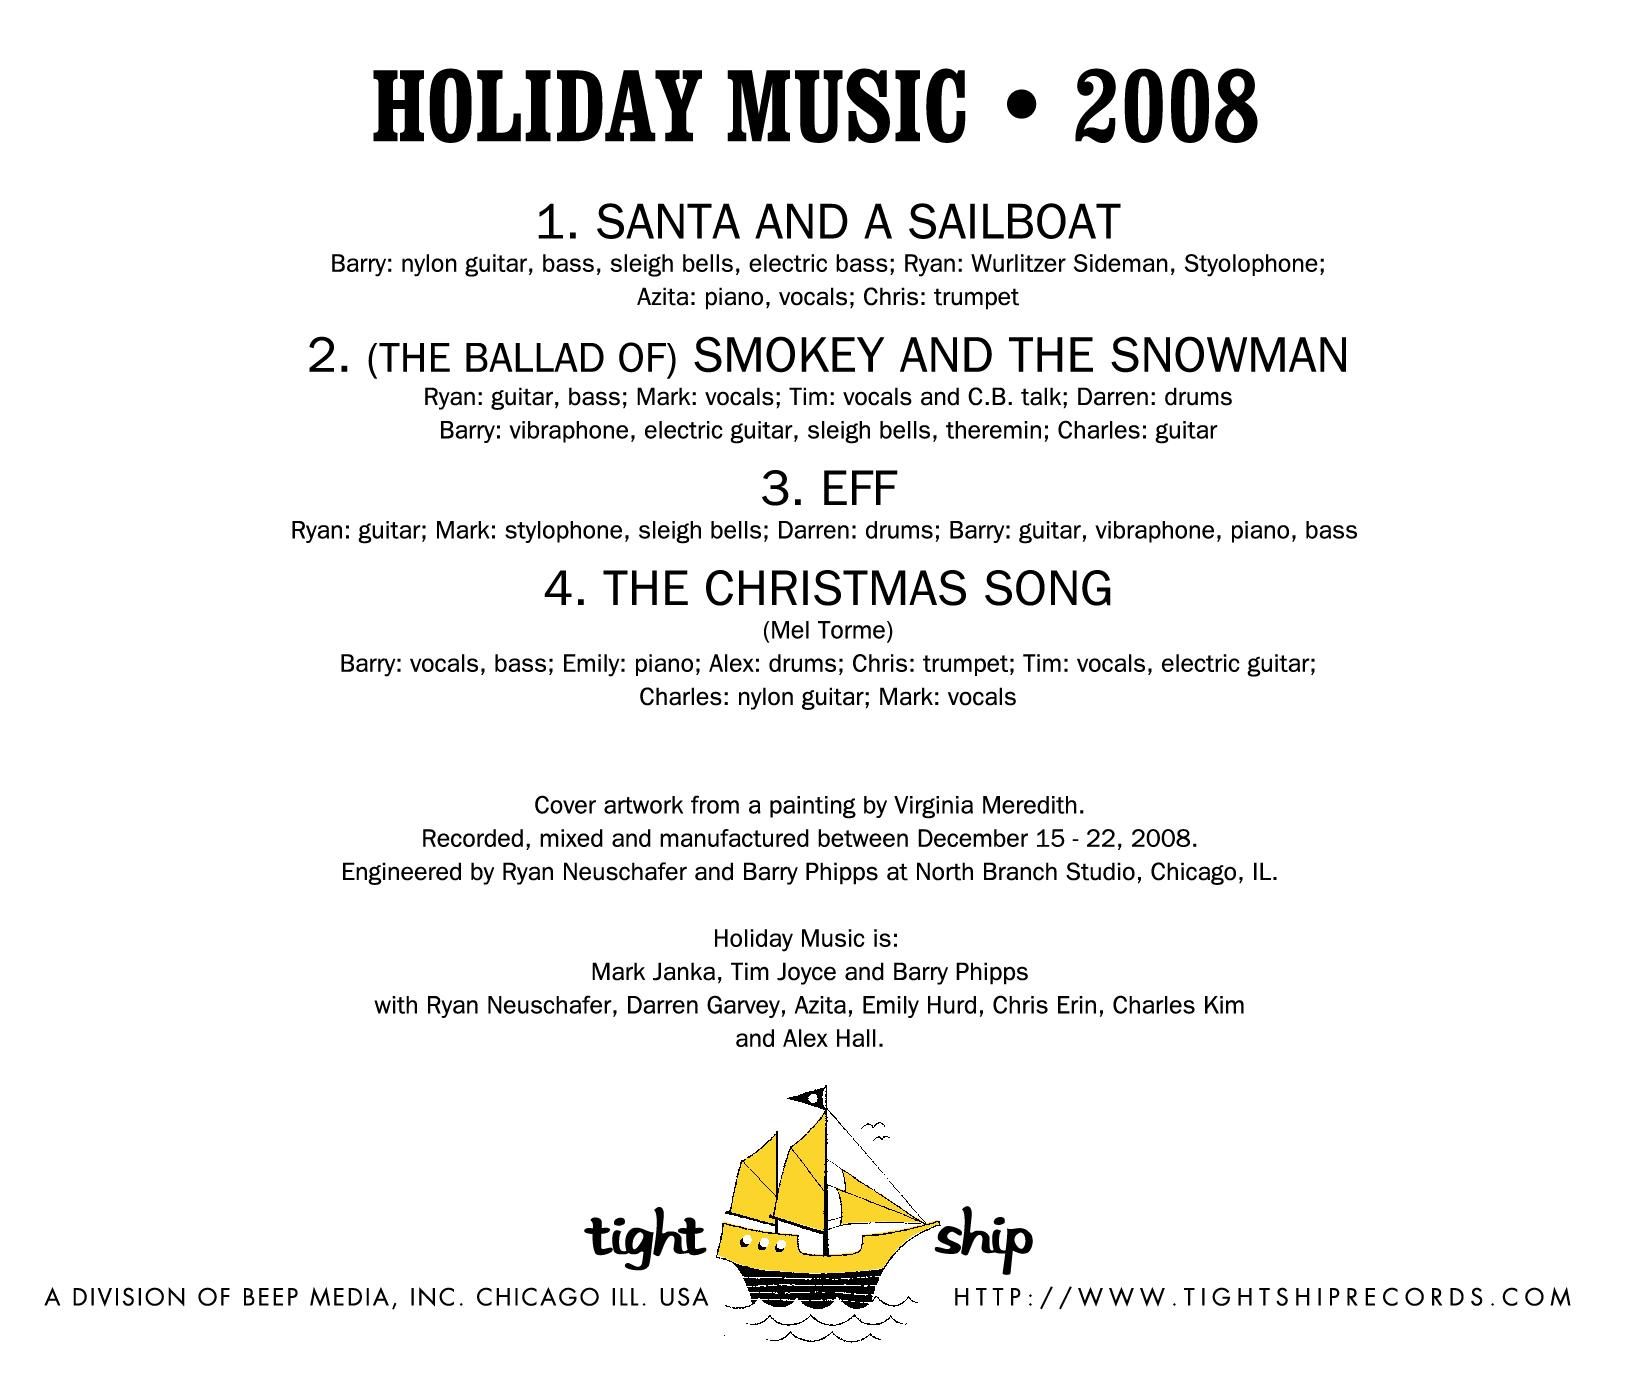 Holiday Music • 2008 back.jpg